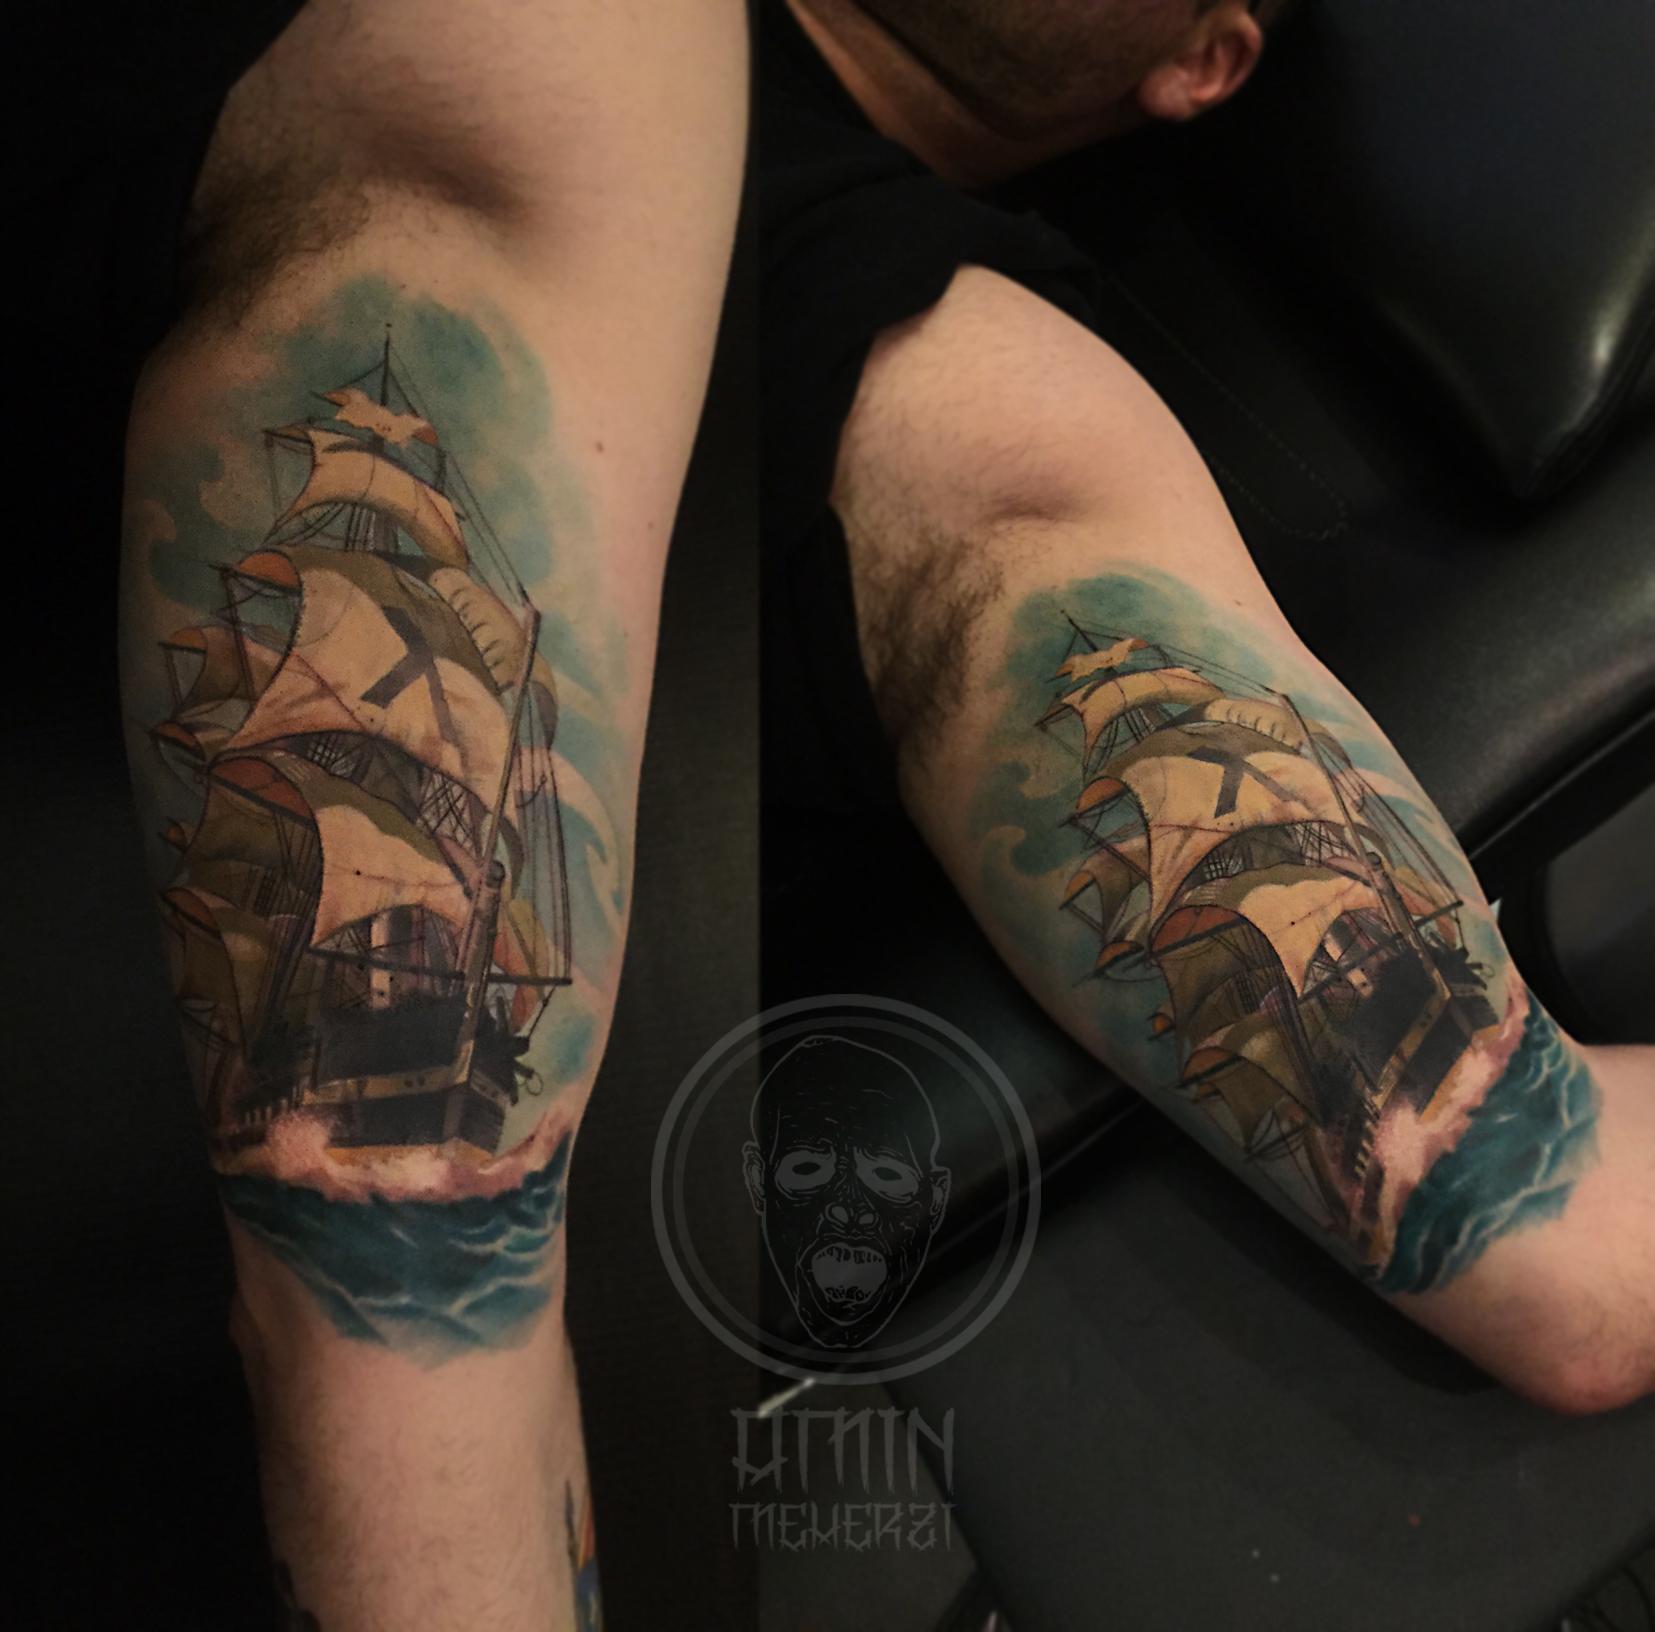 Opus Magnum Tattoo Wien Ship Tattoolife Tattoowork Tattoo Ink Worldofink Inkmaster Tattoogirl Tattooidea Tattoos Tattooworks Viennatattoo Tattoomagazine Tattooconvention Inkwork Realisictattoo Realisticink Tattooshop Blackandgrey Blackandgraytattoo Skin Skinartmag tattoorevuemag supportgoodtattooing sharonalday tattoocommunity tattooedlife tattooed inkedup tattooculture artwork tattooscout tattoodo tattoodobabes myworldofink  tattu tatu opusmagnumtattoo killerink besttattoo besttattooing bestoftattooink tattooing mastertattoo mastertattooing mastertatu mastertattooer tattooer besttattooever bestinktattoo besttattooartist  tattooartist reasliticartist realistictattooartist tattooingartist  inkartist awsometattoo awsomtattooartist awsomtattooartists awsomtattooing awsomink awsomtattoorealistic awsomtattoohyperrealistic nicetattoo nicetattooart nicetattoowork nicetattooink nicetattooart famoustattoo famoustattooart famousartwork famostattooartist goodtattooing goodtattoos goodtattoorealistic tattooconvention inportainttattoo importainttattooart importainttattoowork importaintartist importantrealistictattoo importainttattooing tattoogun amintattoo aminart aminmeherzitattoo amintattooartist amin aminartist meherzitattoo aminmeherzi 1150wien schweglerstaße skintattoo tattoooftheday tattoooftheweek tattooofthejear tattooprice tattooinfinity tattoos tattooblack tattooapointment tattooaustria usatattoo lining liningtattoo insta instagram facebook fb projecttattoo project love fun progressing progress artofopusmagnum artofopus artofmagnum sullen sullentattoo sullenart sullenink worldfamousink killerinktattoo killerink killerinkamin shading shadingtattoo  sullen sullenfamily girlswithtattoo boyswithtattoo inkedman inkedboy inkedgirl design style tattoostyle lovemyjob lovetattoos wowtattoo realism realismtattoo realismtattooart silverbackink silverbacktattoo silverback tattooartgallarie gallerie galleri pritty prittytattoo prittytattooidea prittytattooing freshlyink freshlyinke